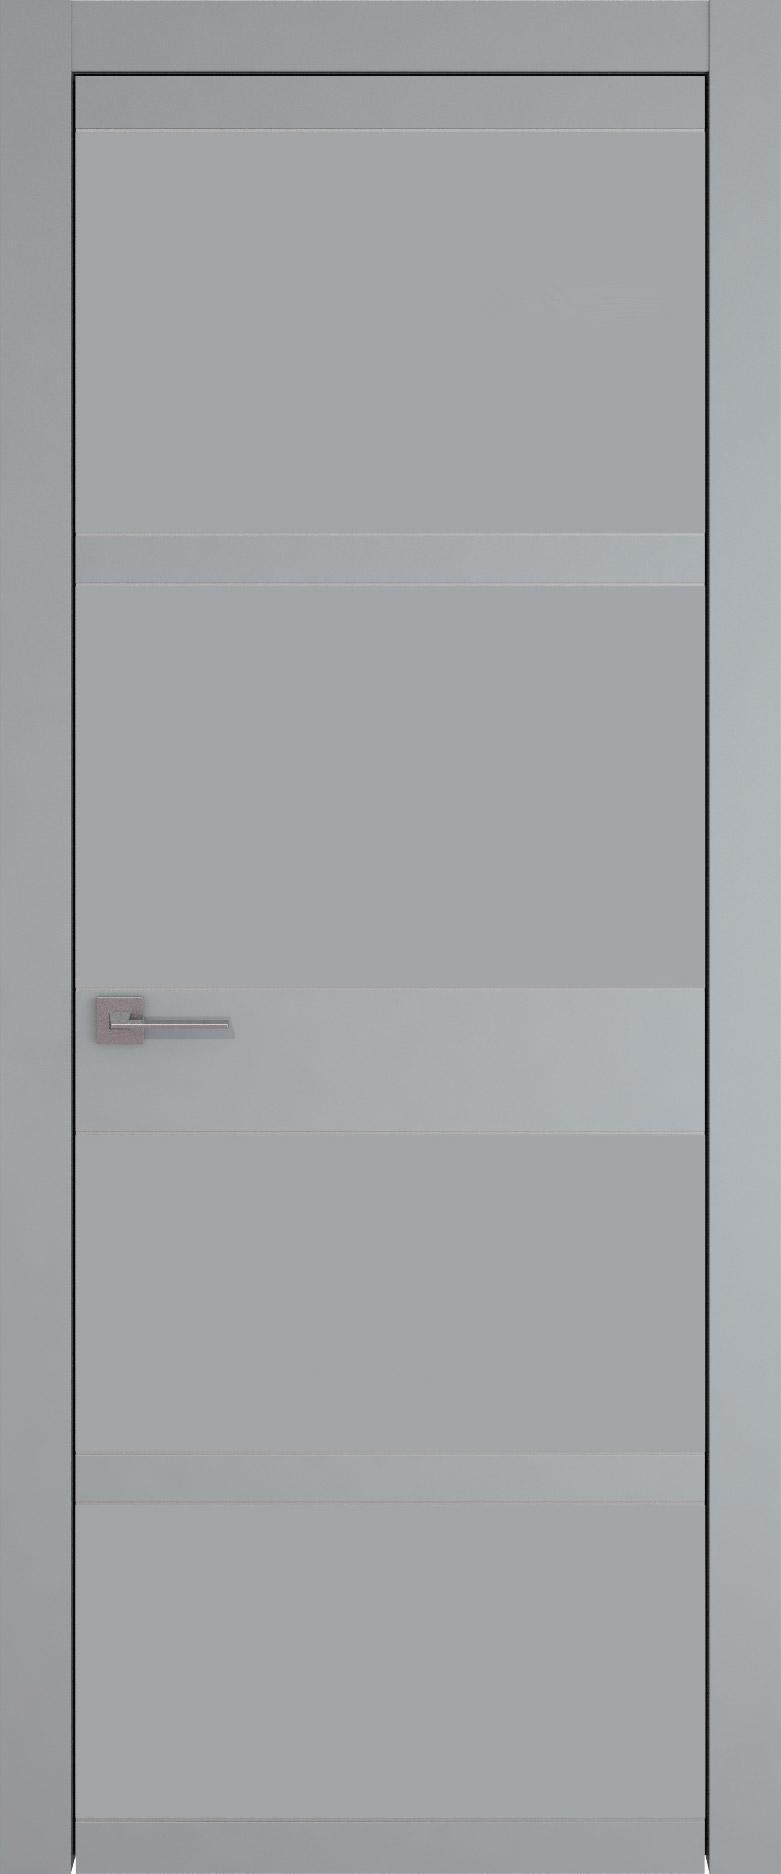 Tivoli Е-2 цвет - Серебристо-серая эмаль (RAL 7045) Без стекла (ДГ)